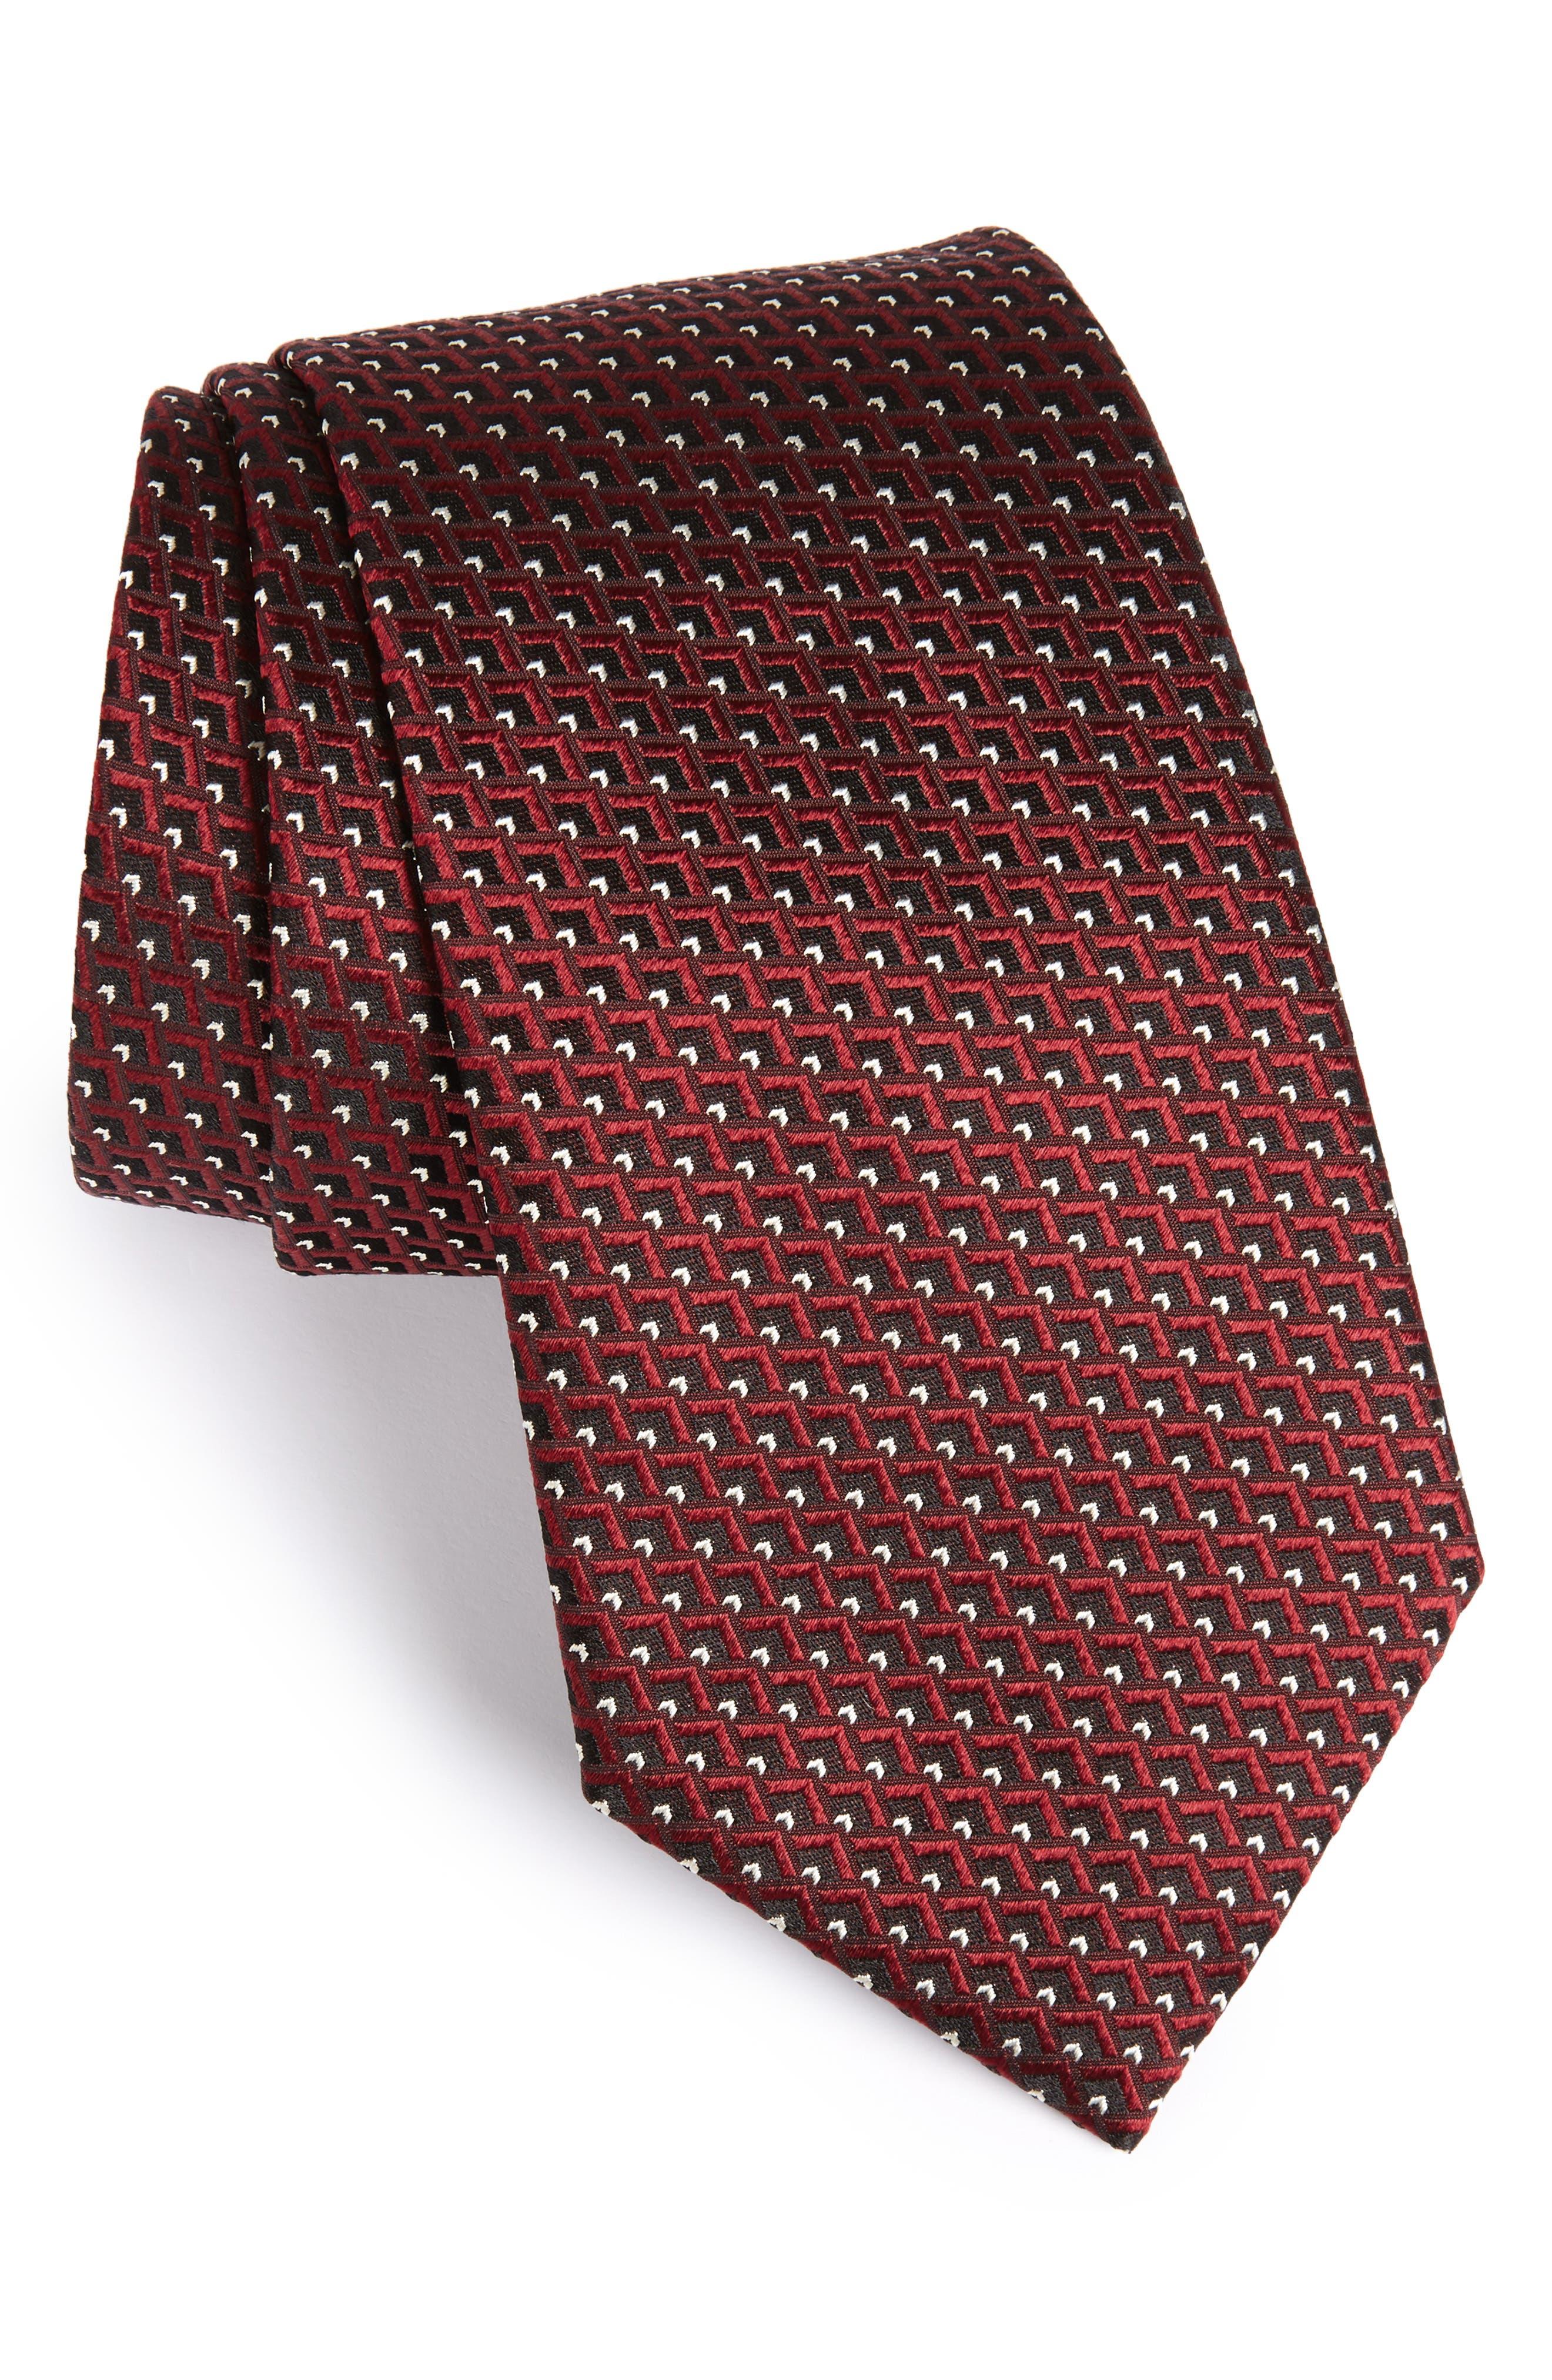 Alternate Image 1 Selected - Ermenegildo Zegna Geomeric Silk Tie